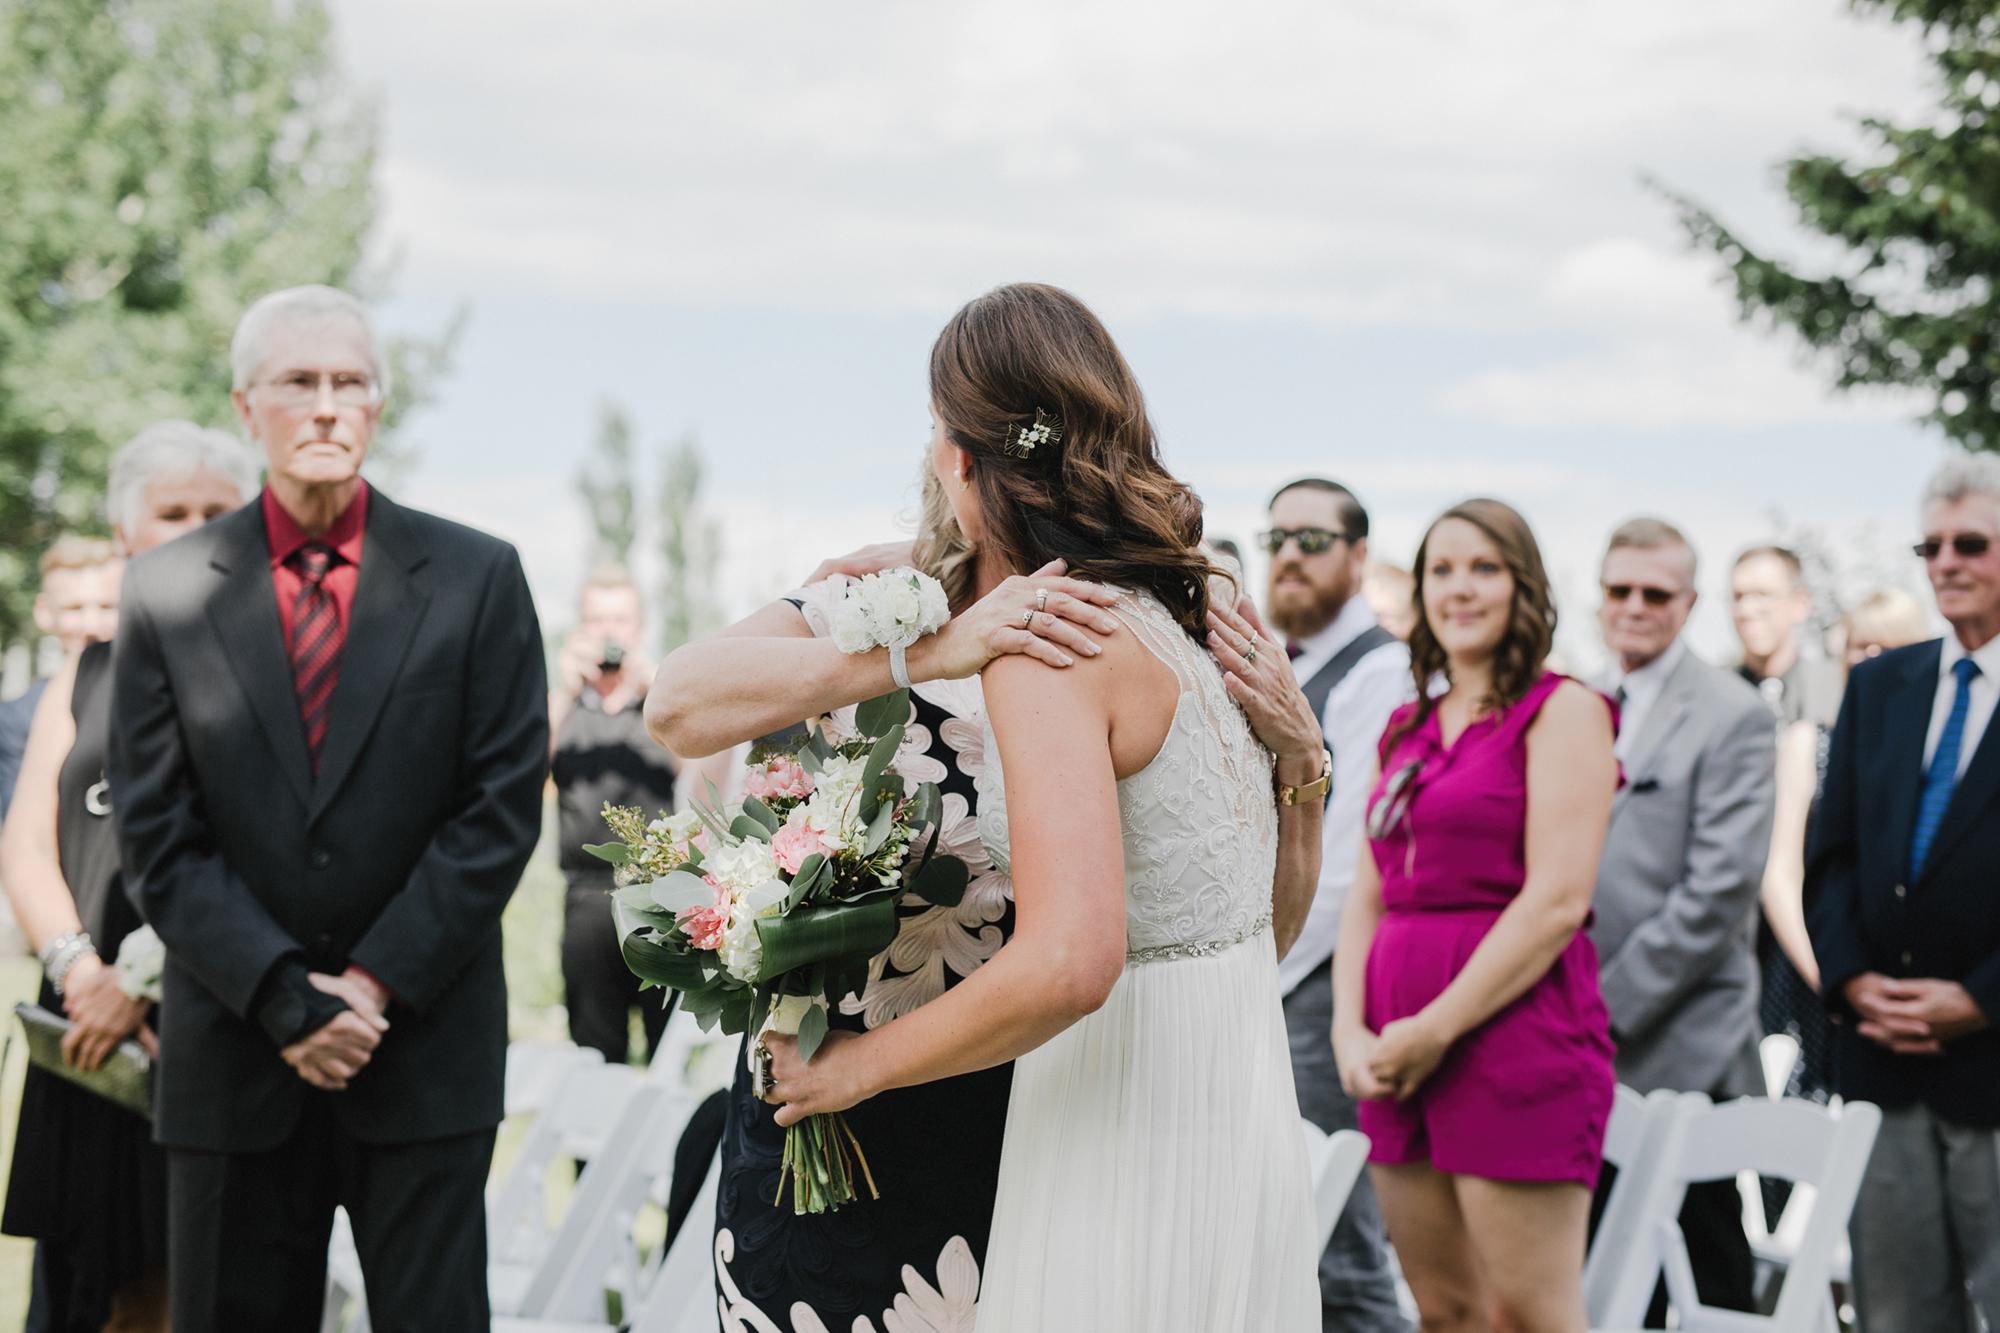 Flower Farm Crowsnest Pass Wedding -052.JPG